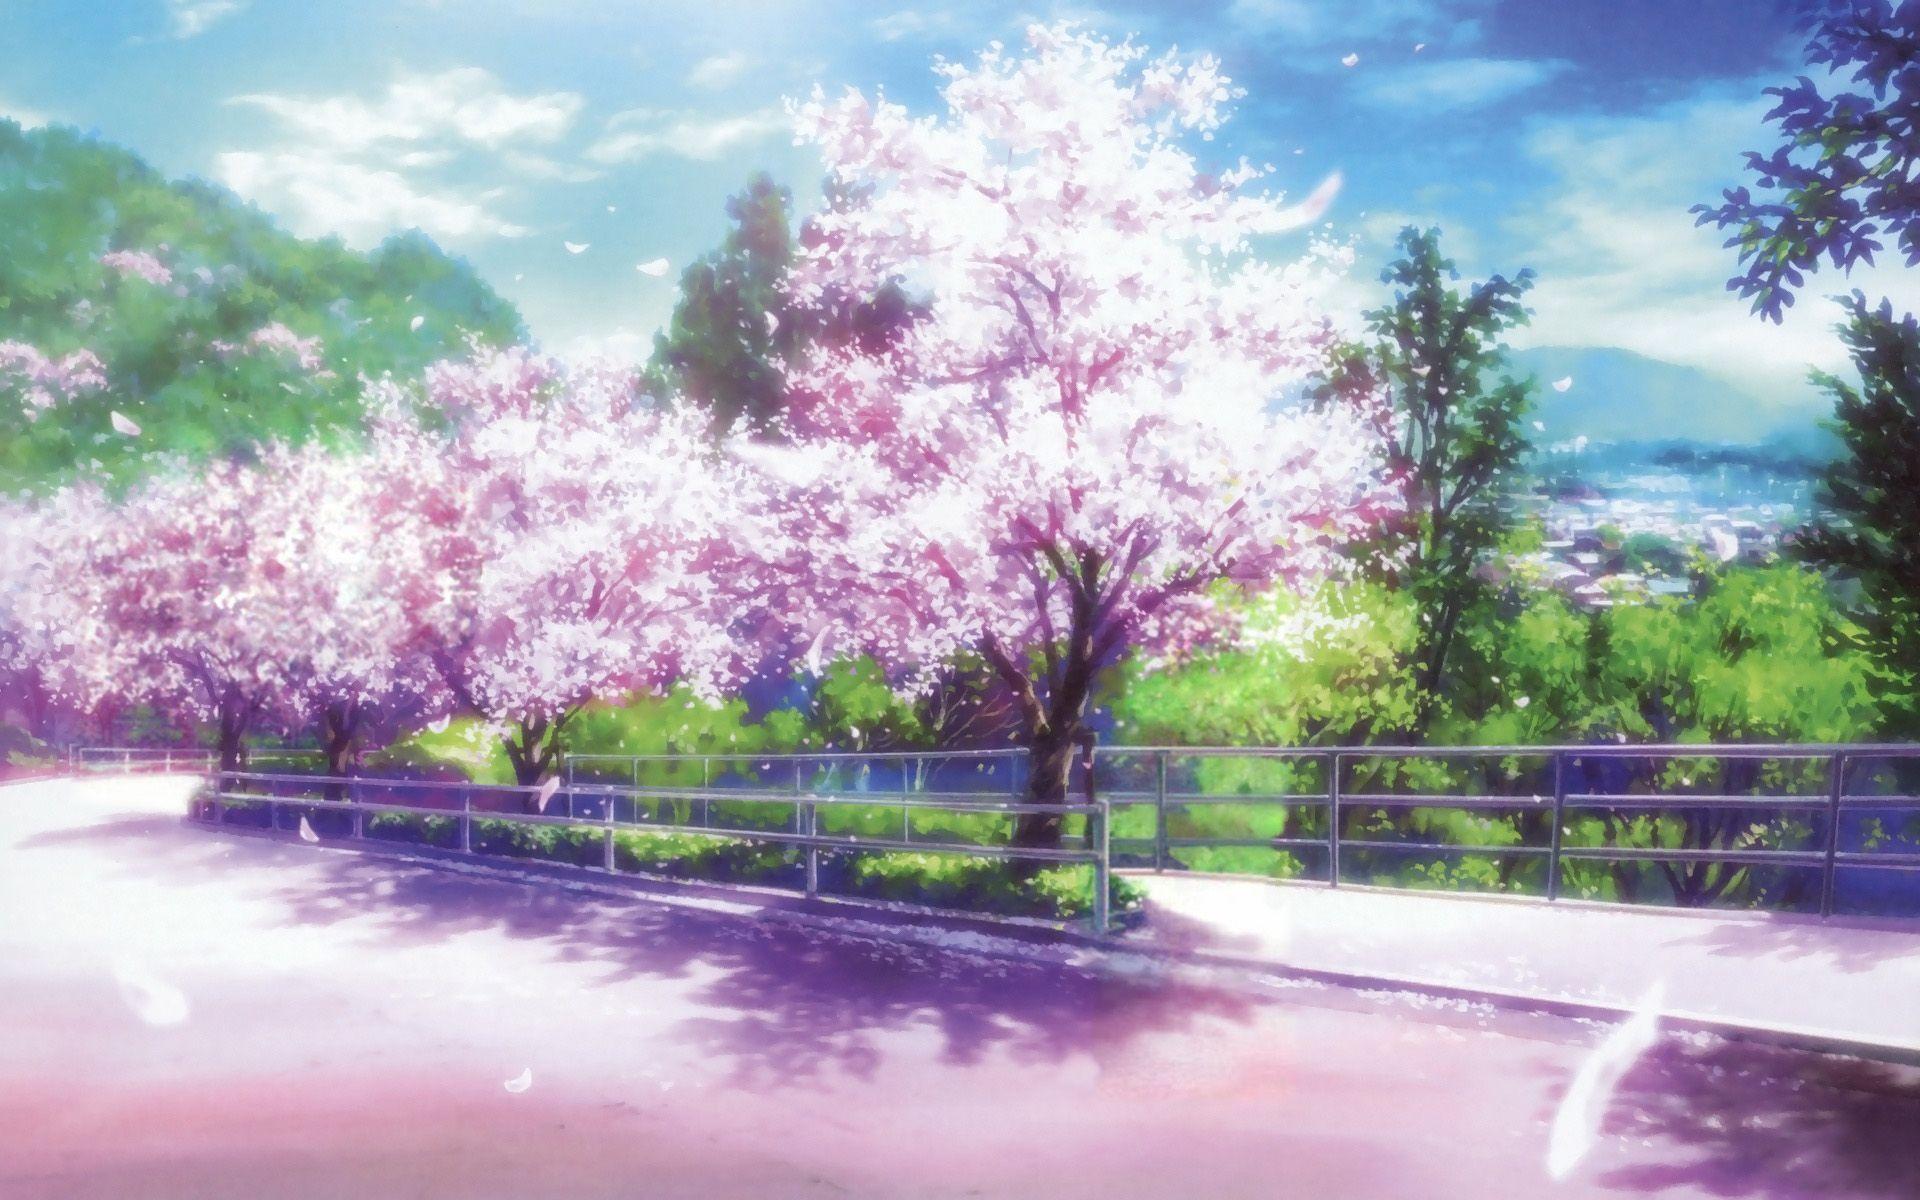 Clannad Cherry Blossom Path Clannad Anime Scenery Anime Background